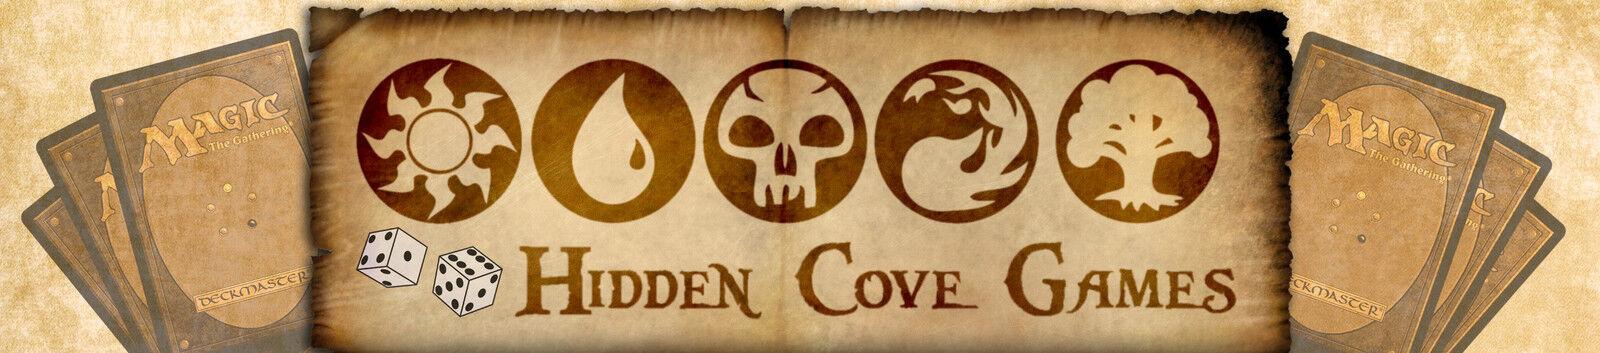 Hidden Cove Games